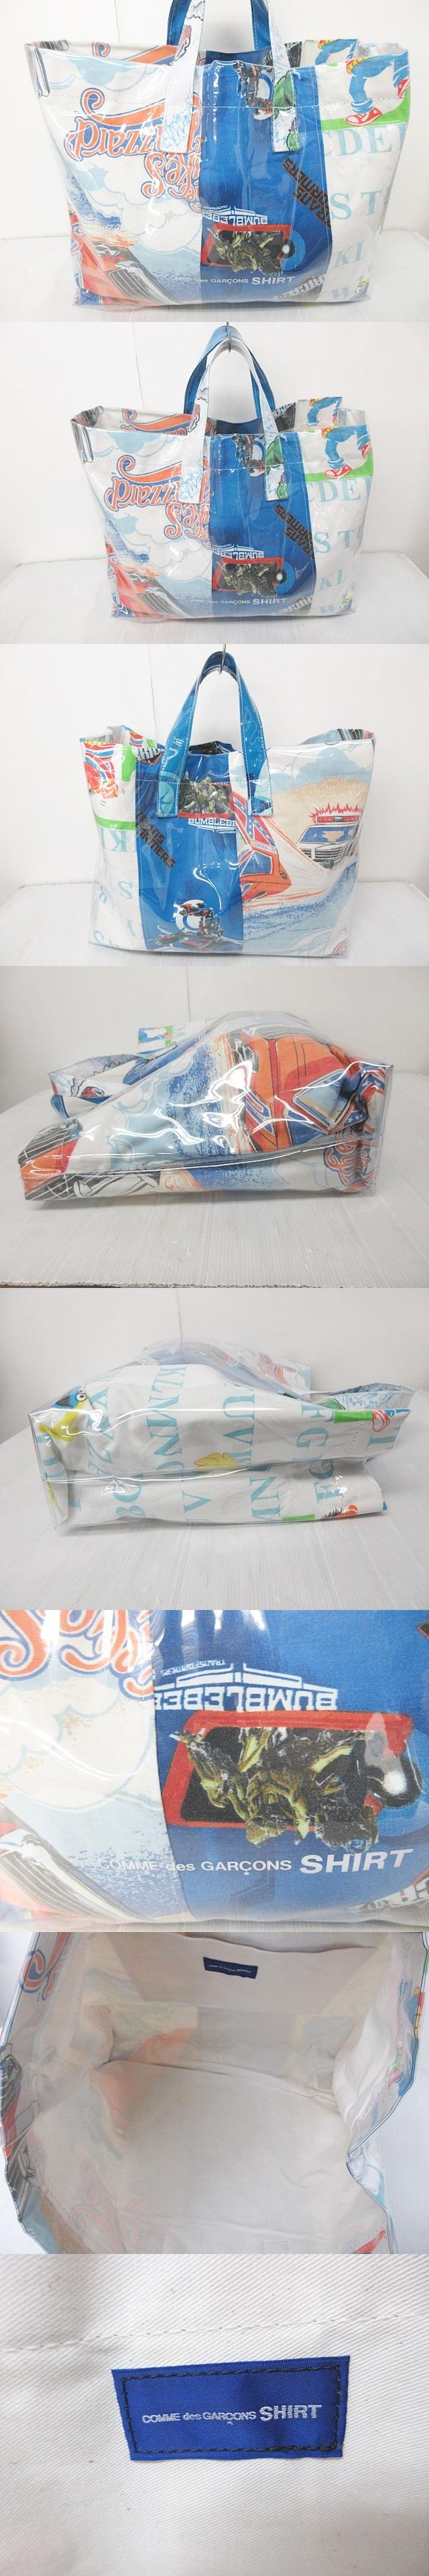 18AW PVC プリント トートバッグ クリアバッグ ビニール ハンドバッグ マルチカラー 0105